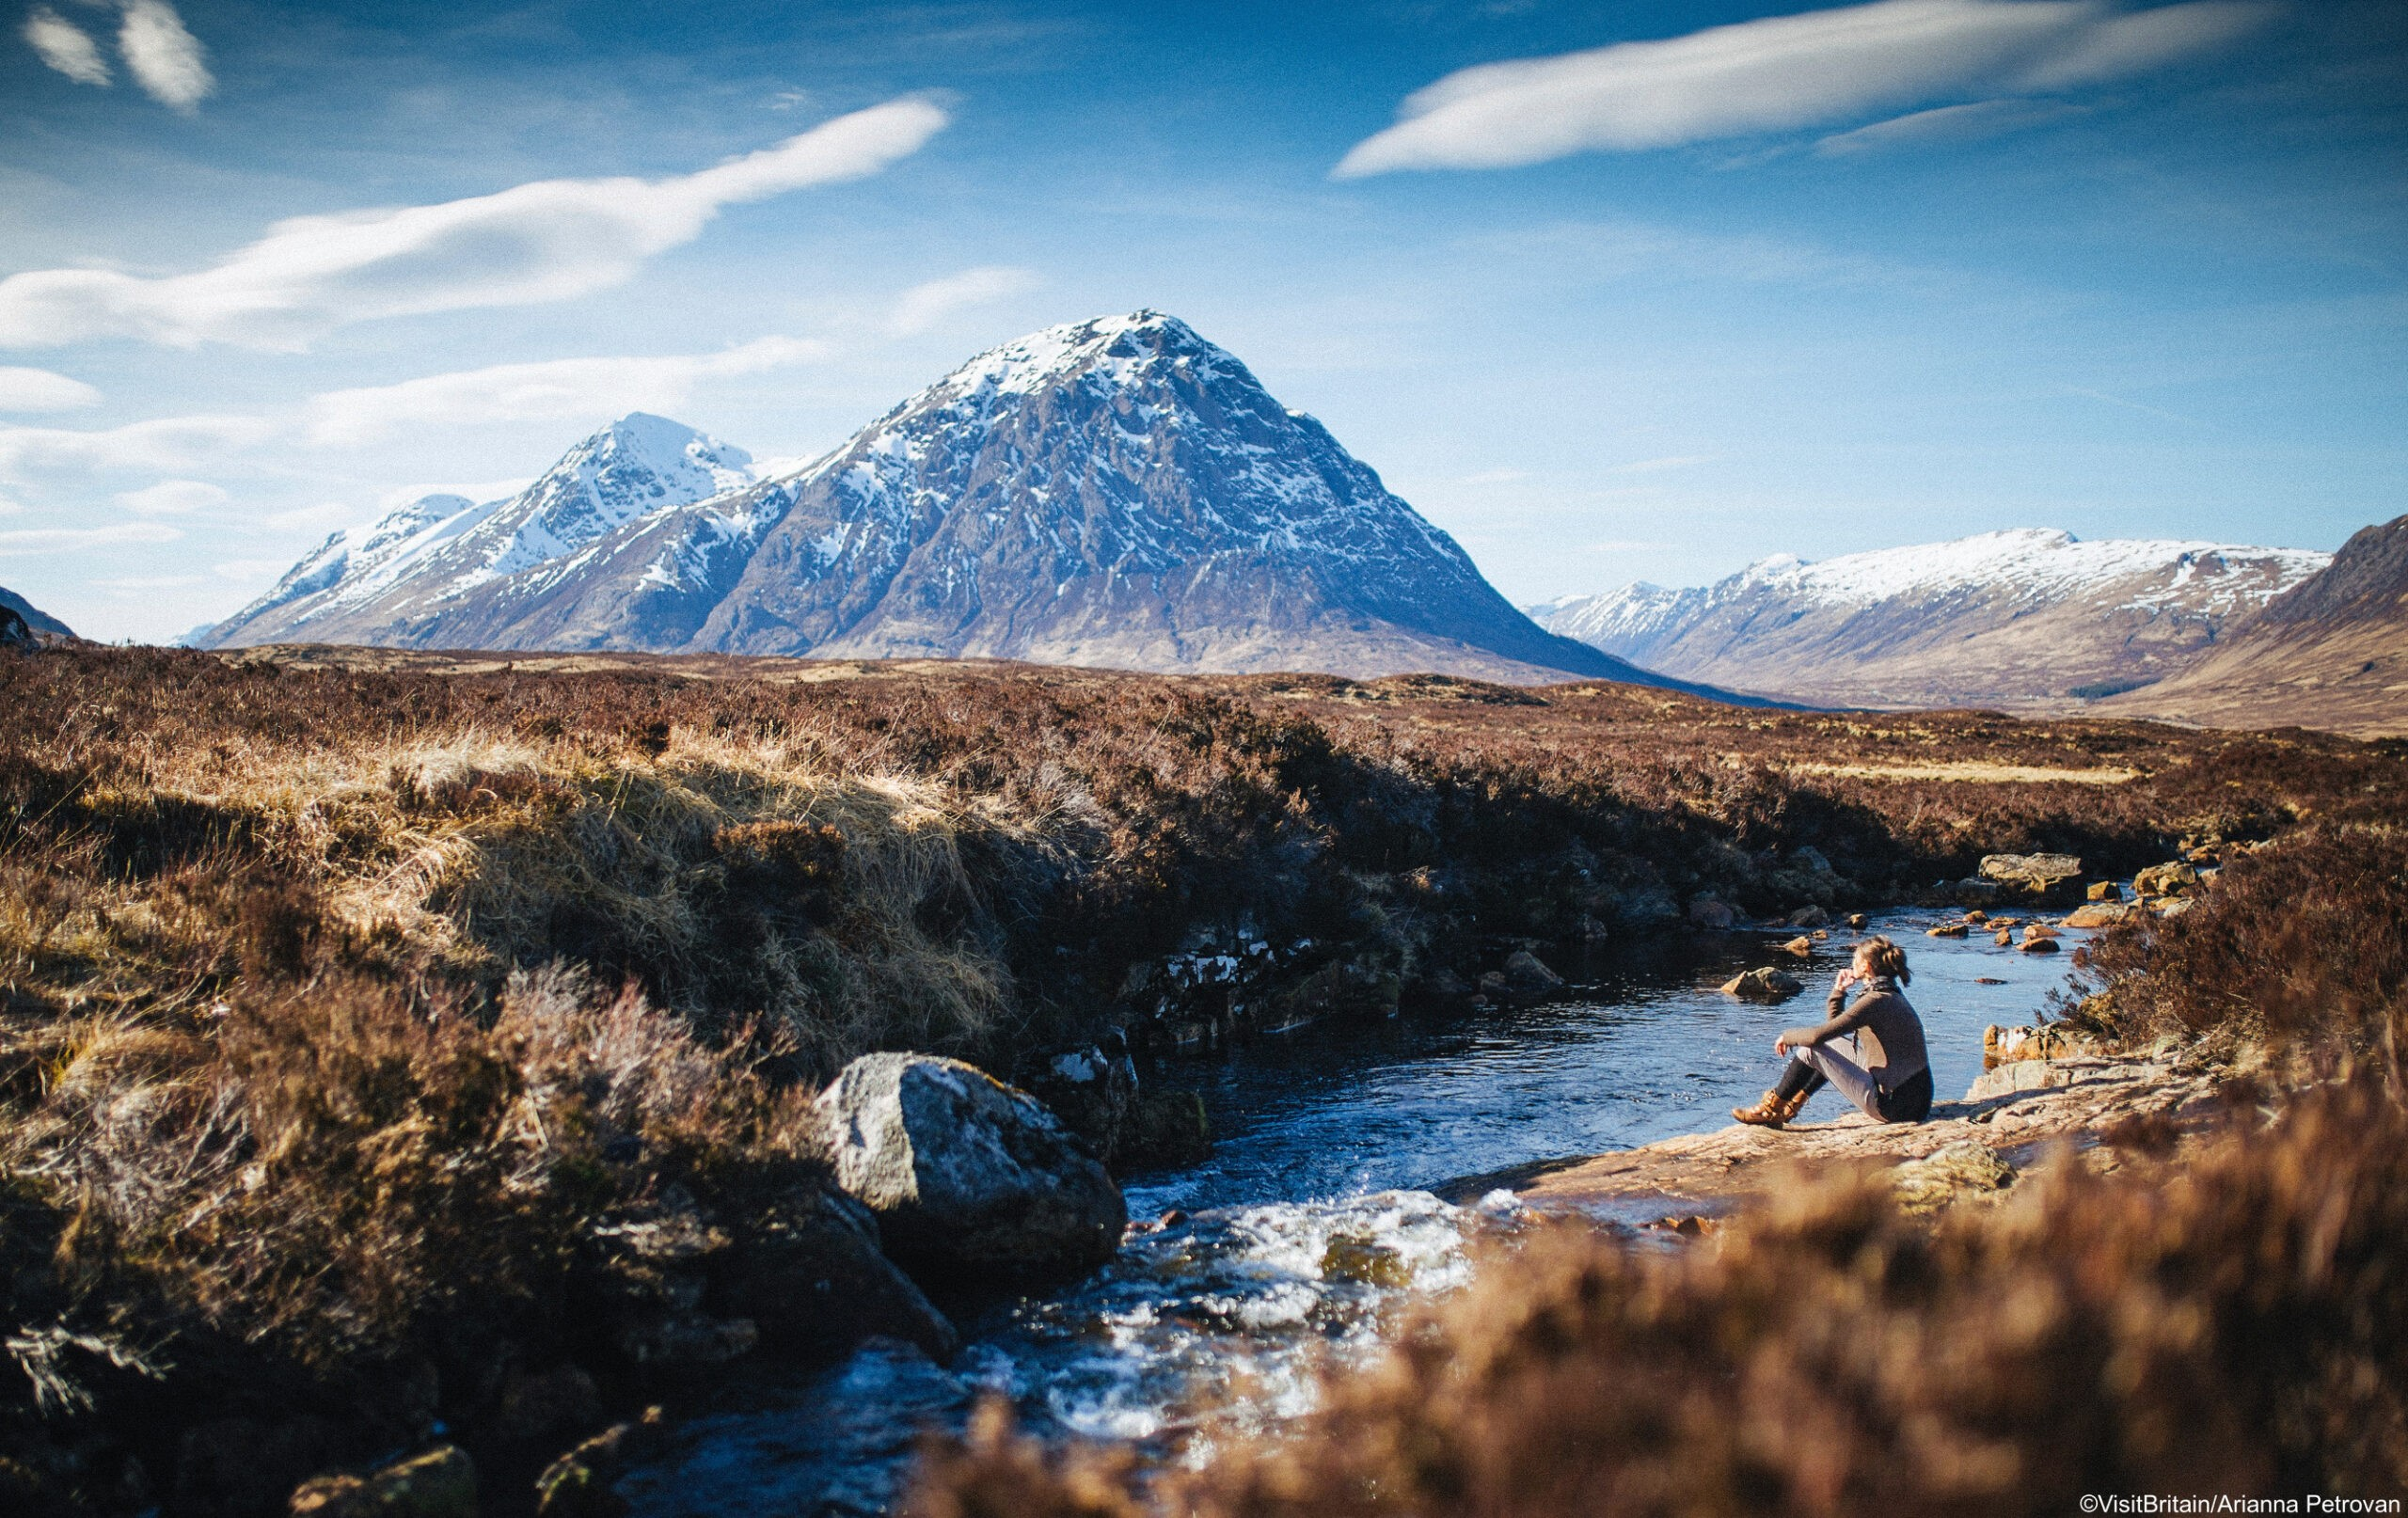 A person sitting enjoying the view, Glencoe, Scotland